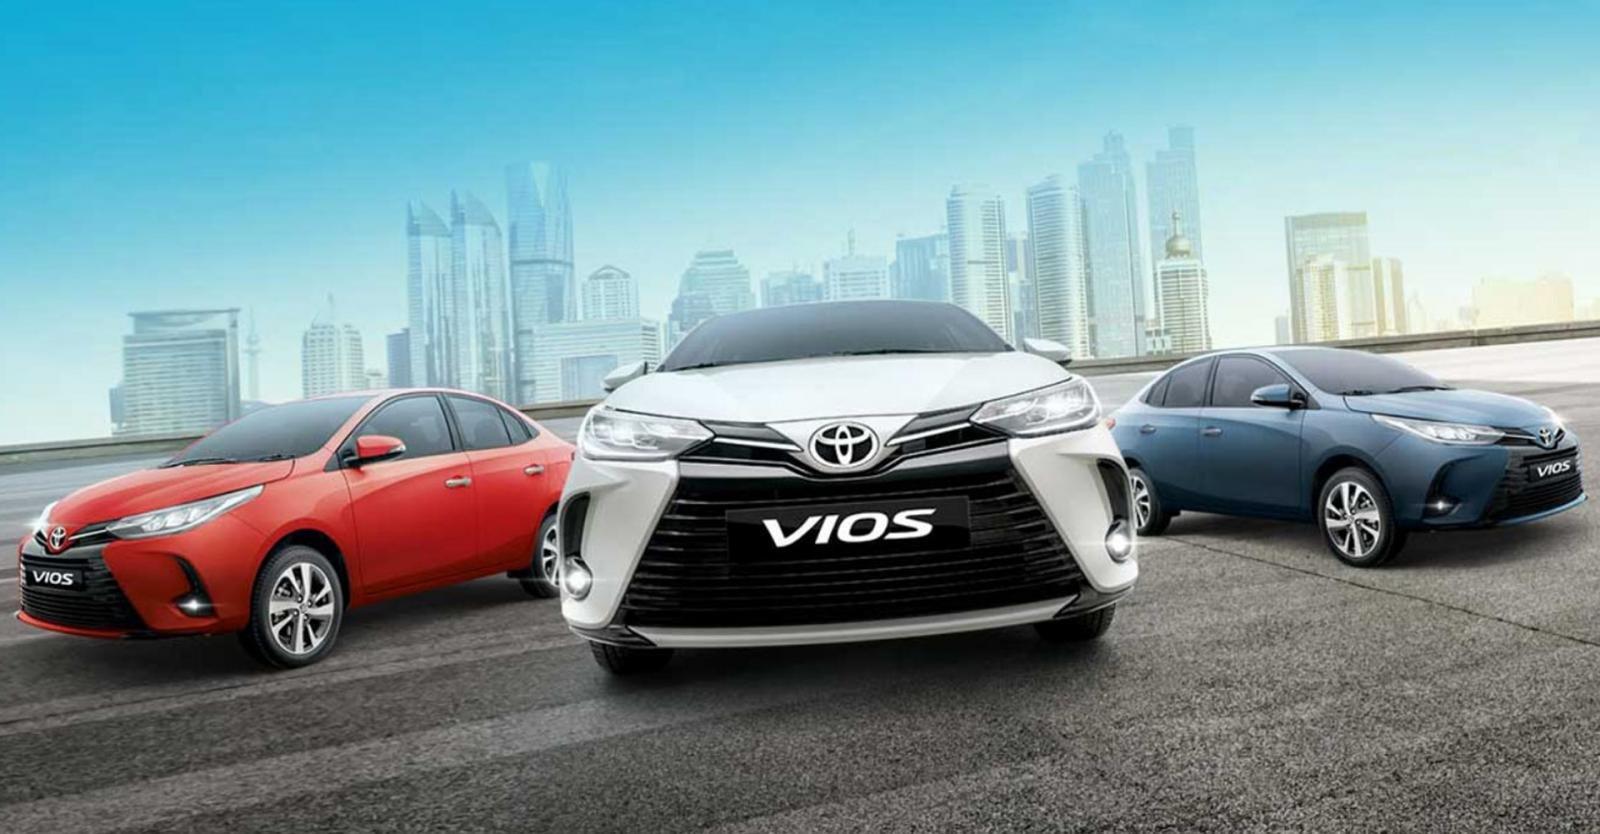 Có 600 triệu nên mua Toyota Vios 5 chỗ hay Toyota Avanza 7 chỗ?